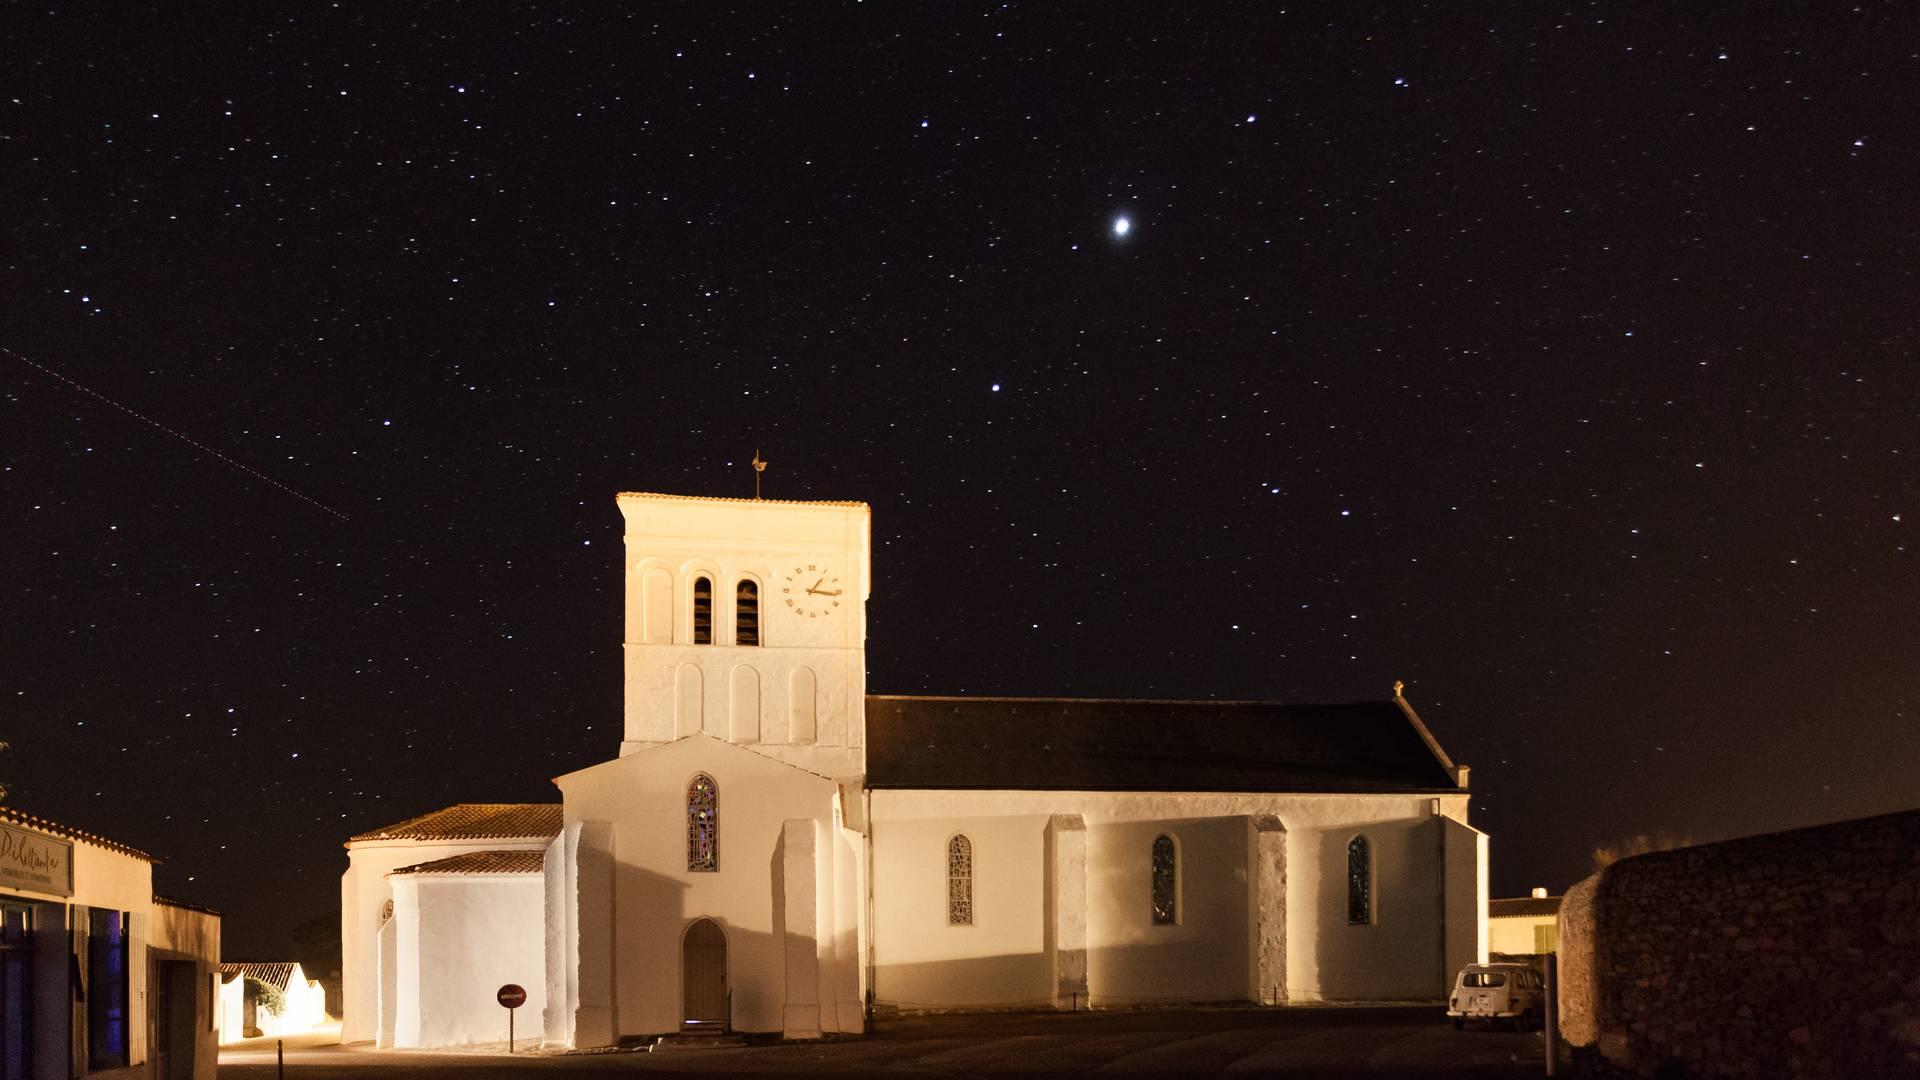 Die Kirche von Saint-Sauveur – Île d'Yeu